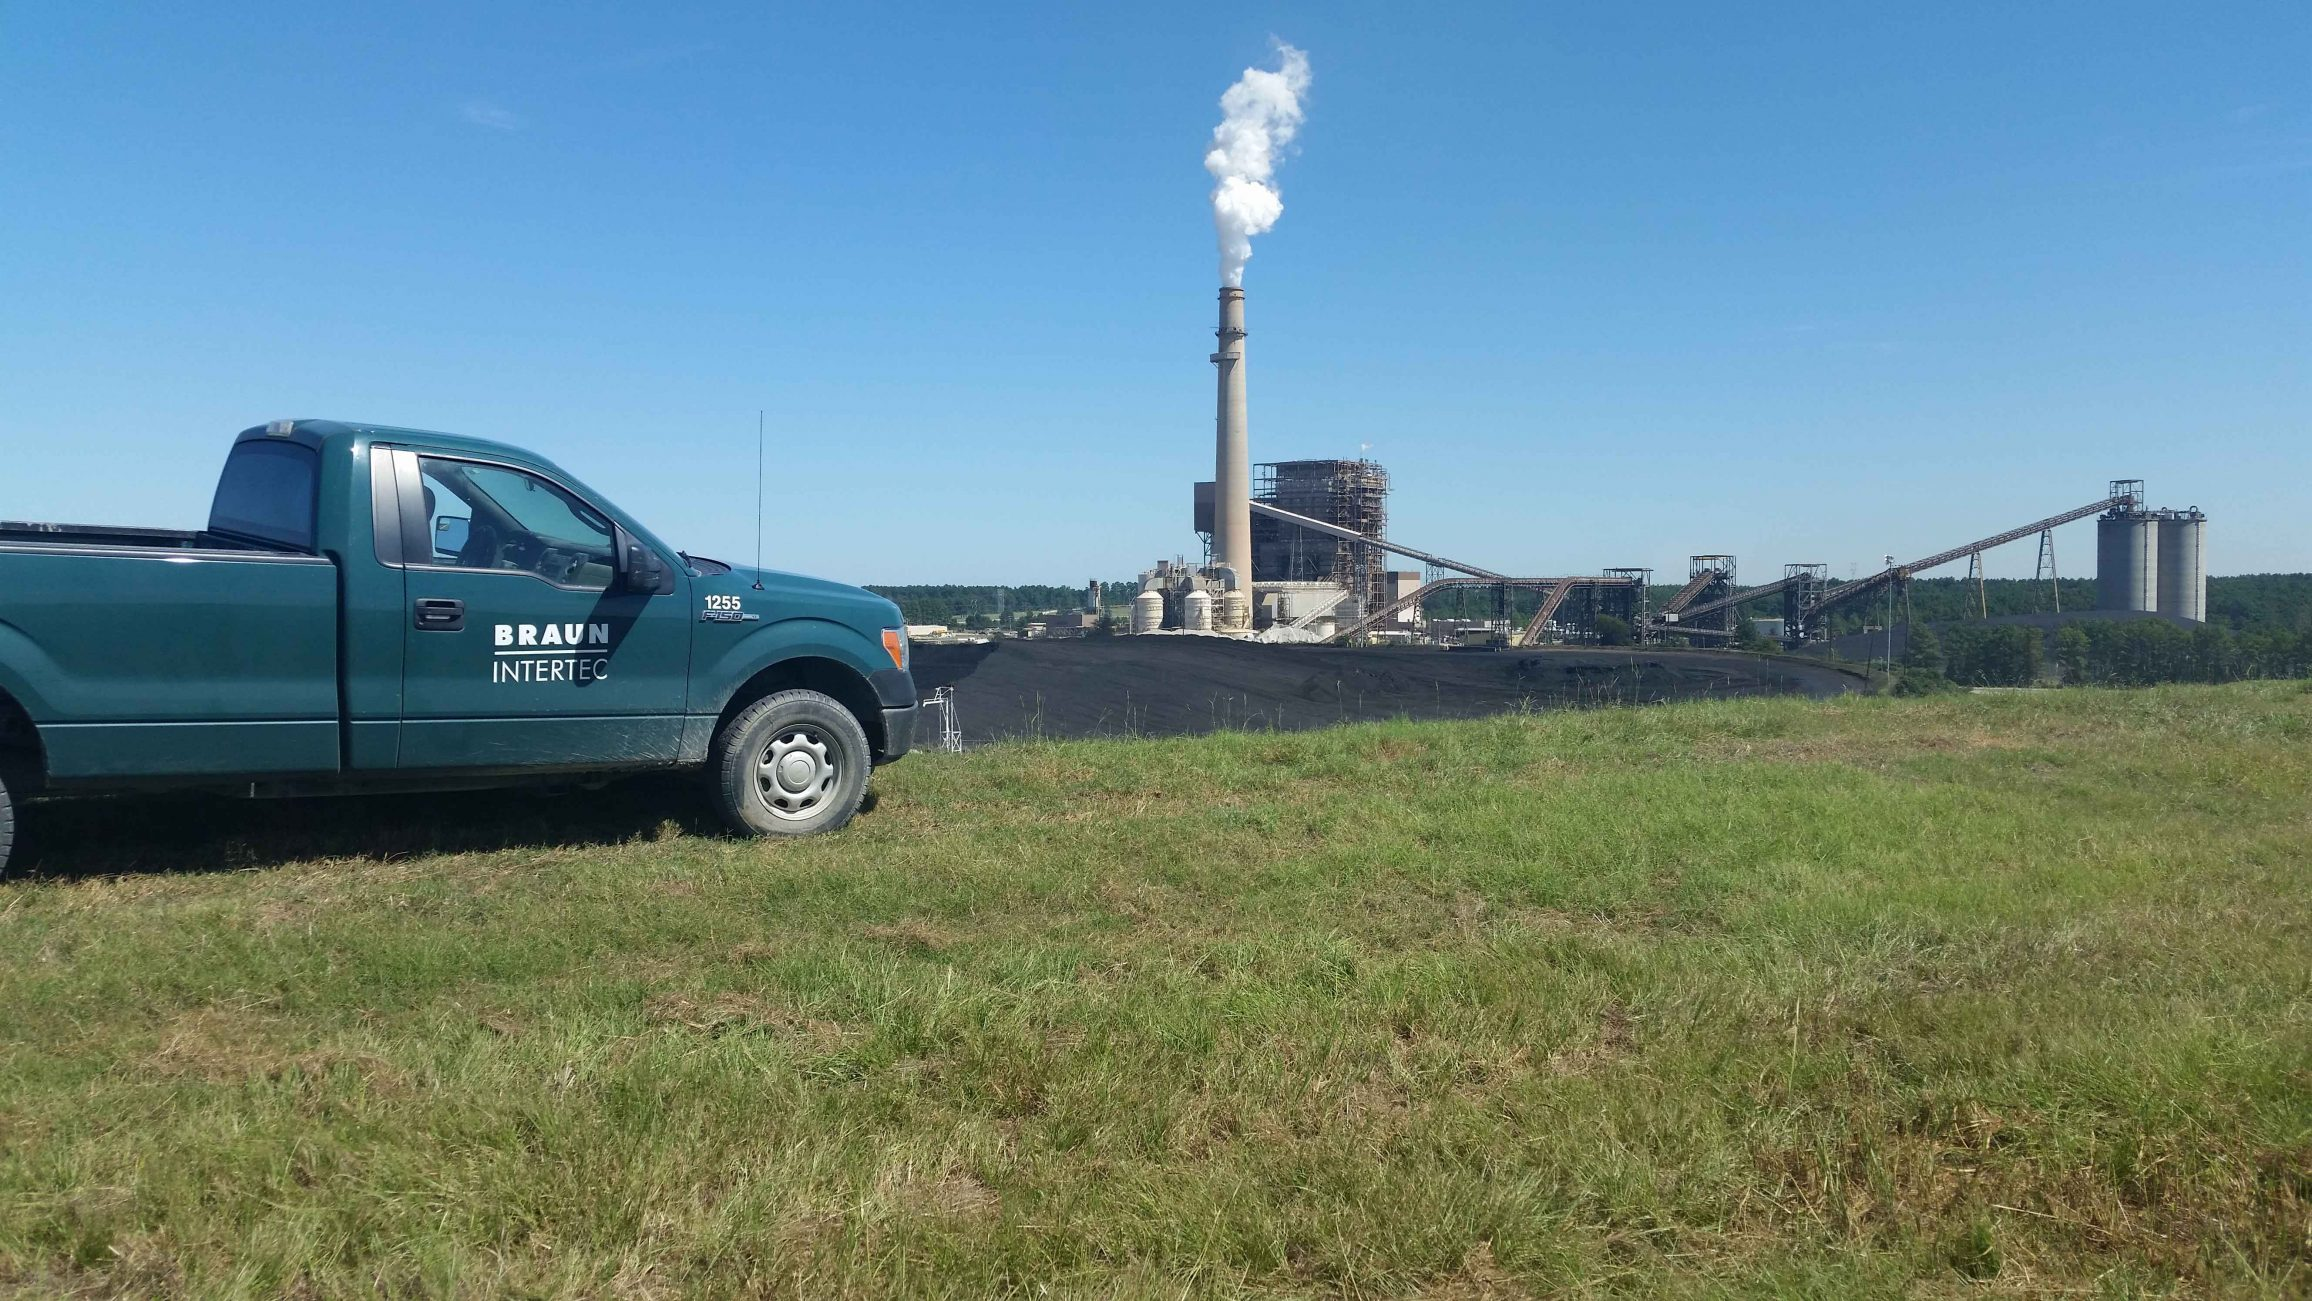 Braun Intertec Truck At Texas Job Site